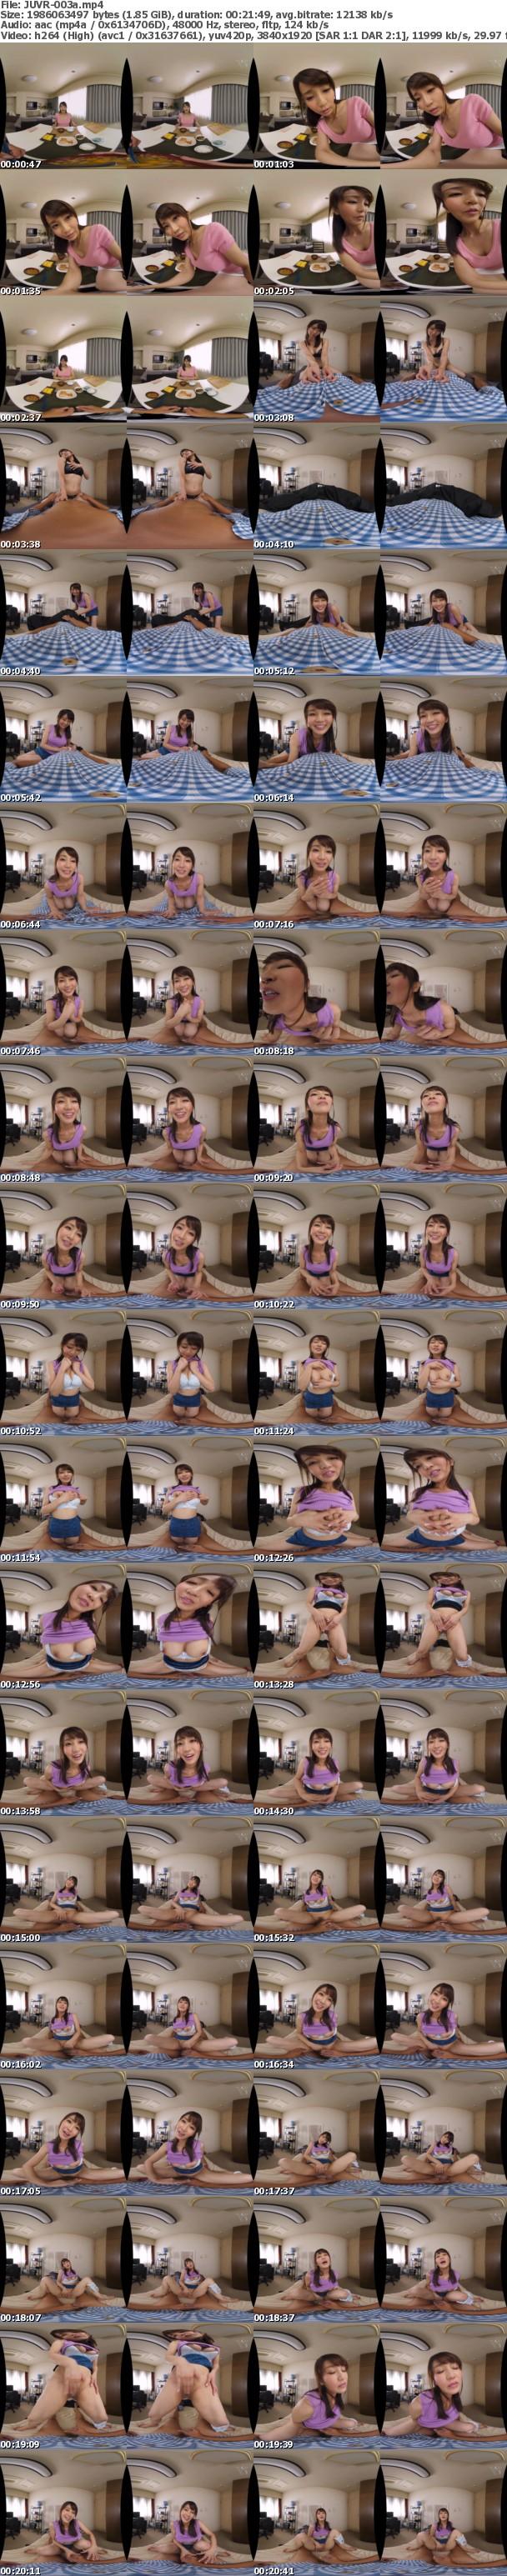 VR/3D JUVR-003 大島優香 初VR!! 何をしても笑顔で許してくれる理想の義母さん 優香ママが教えてくれる性の手ほどき 丸ごと体験VR